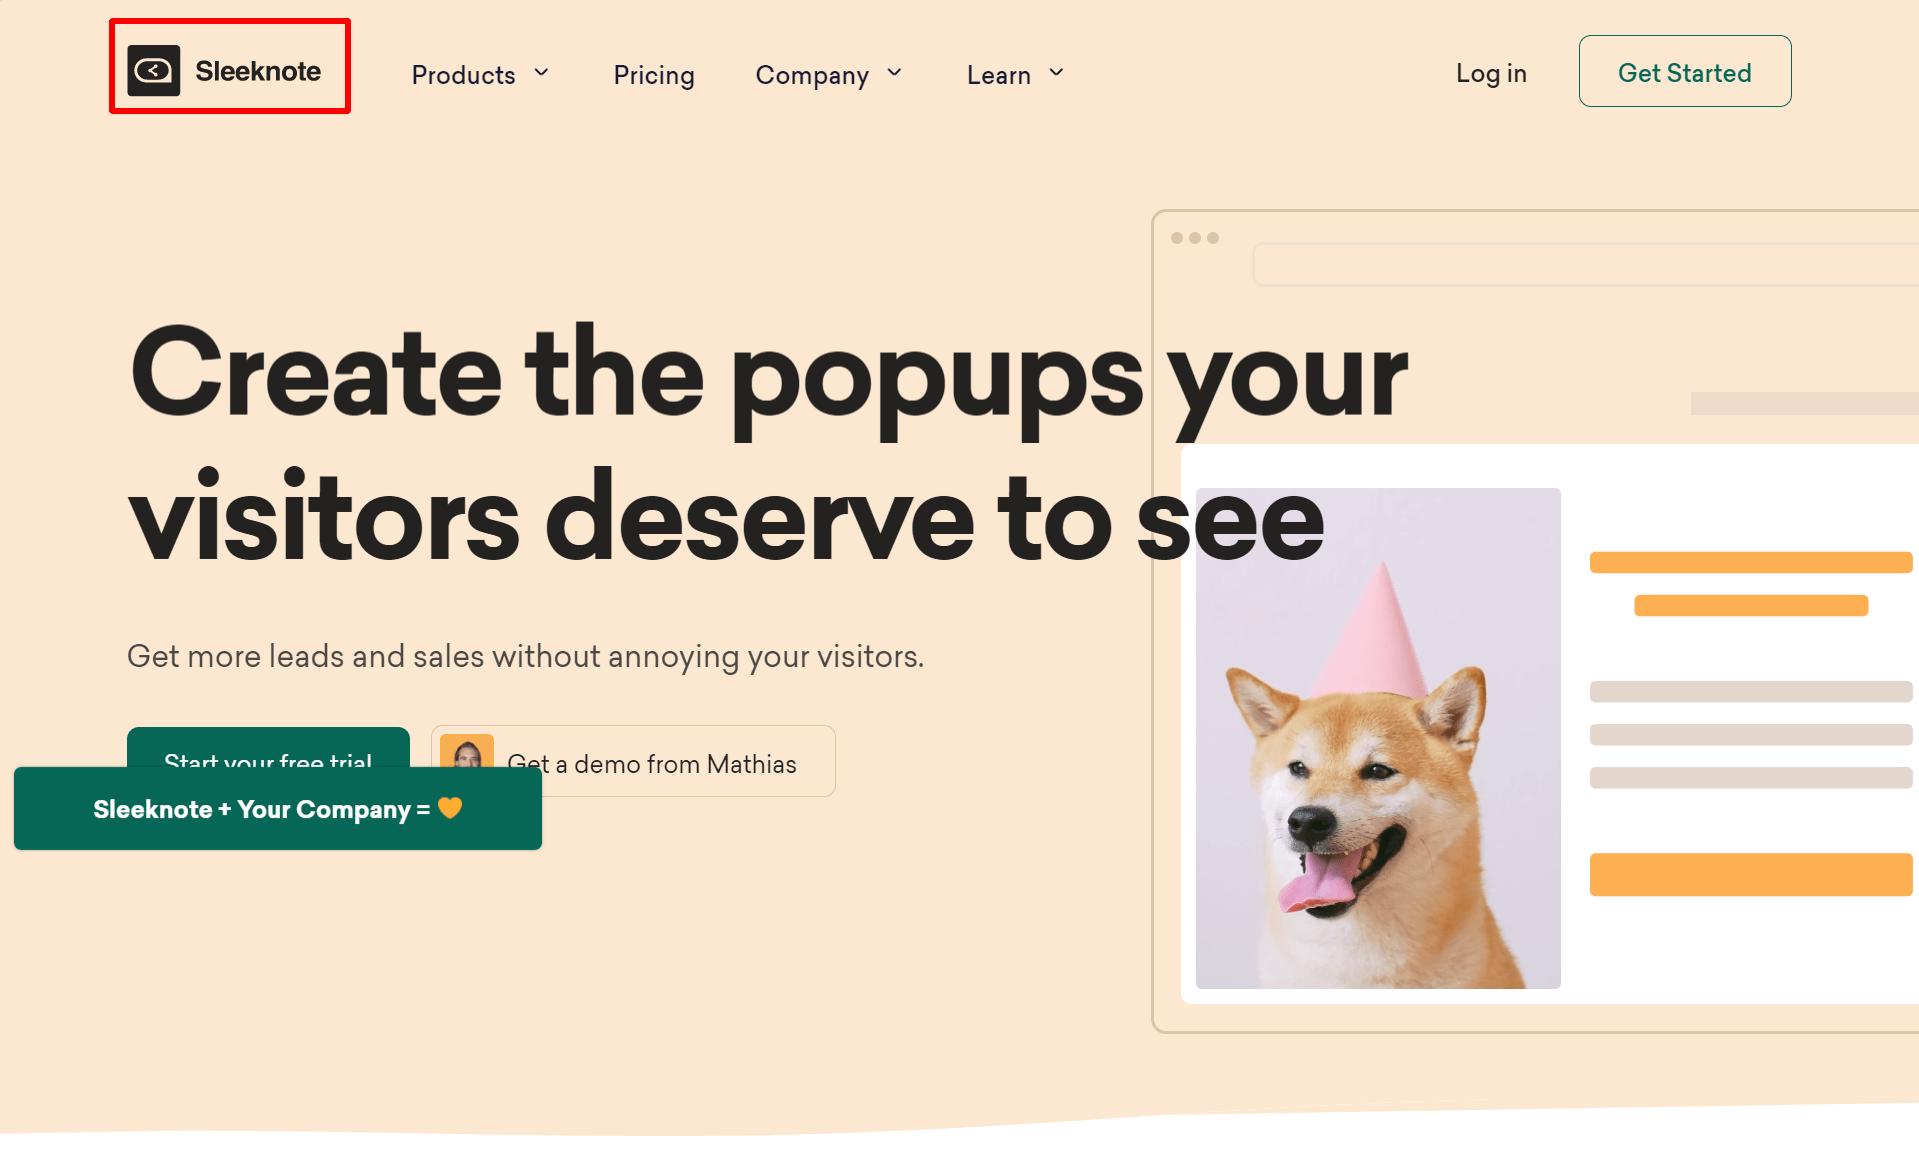 Sleeknote-The-Internet-s-Favorite-Popup-Builder